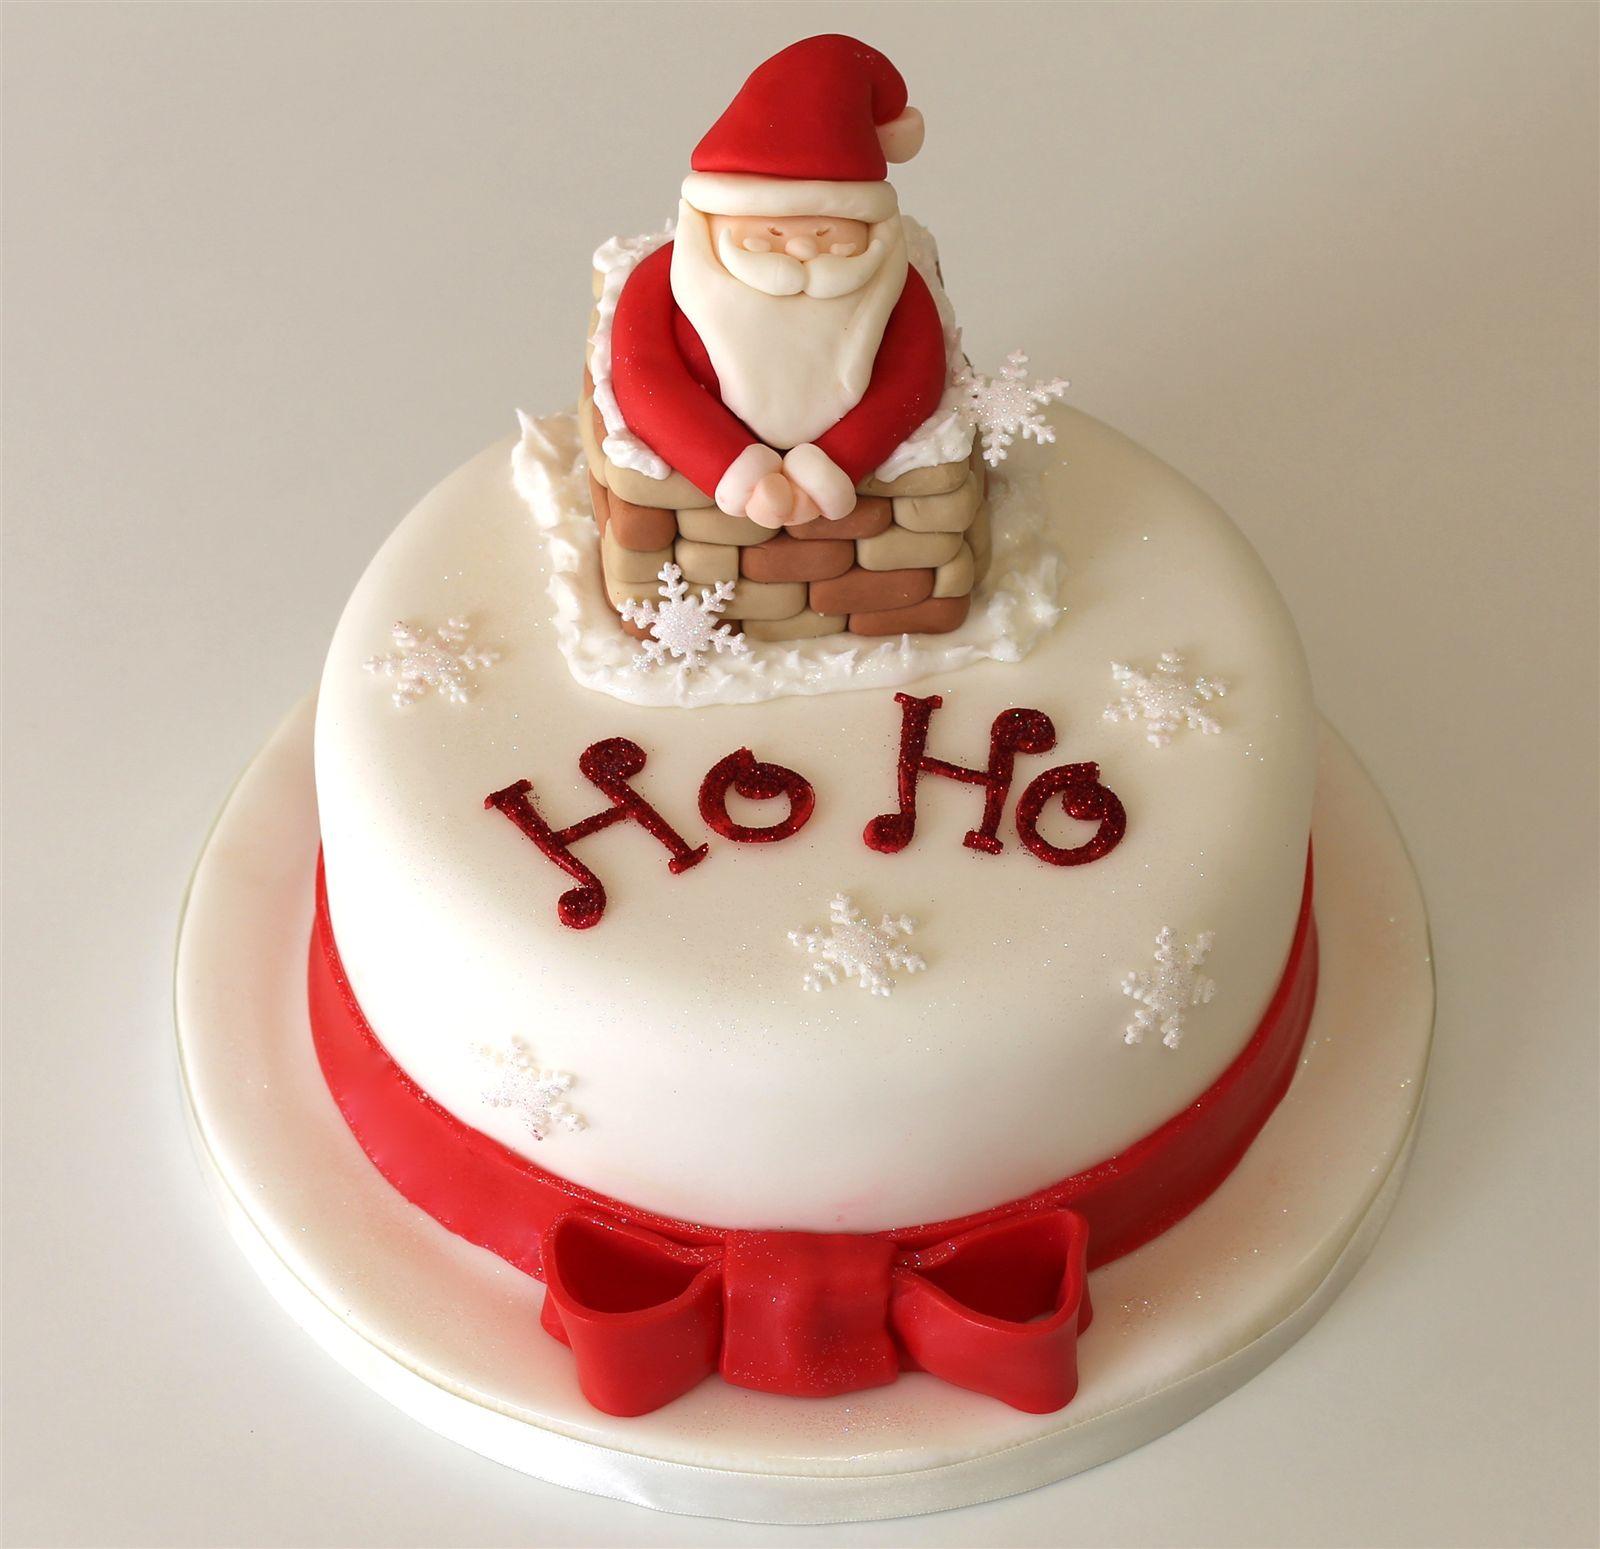 Birthday Cakes For You: Santa Claus Cake